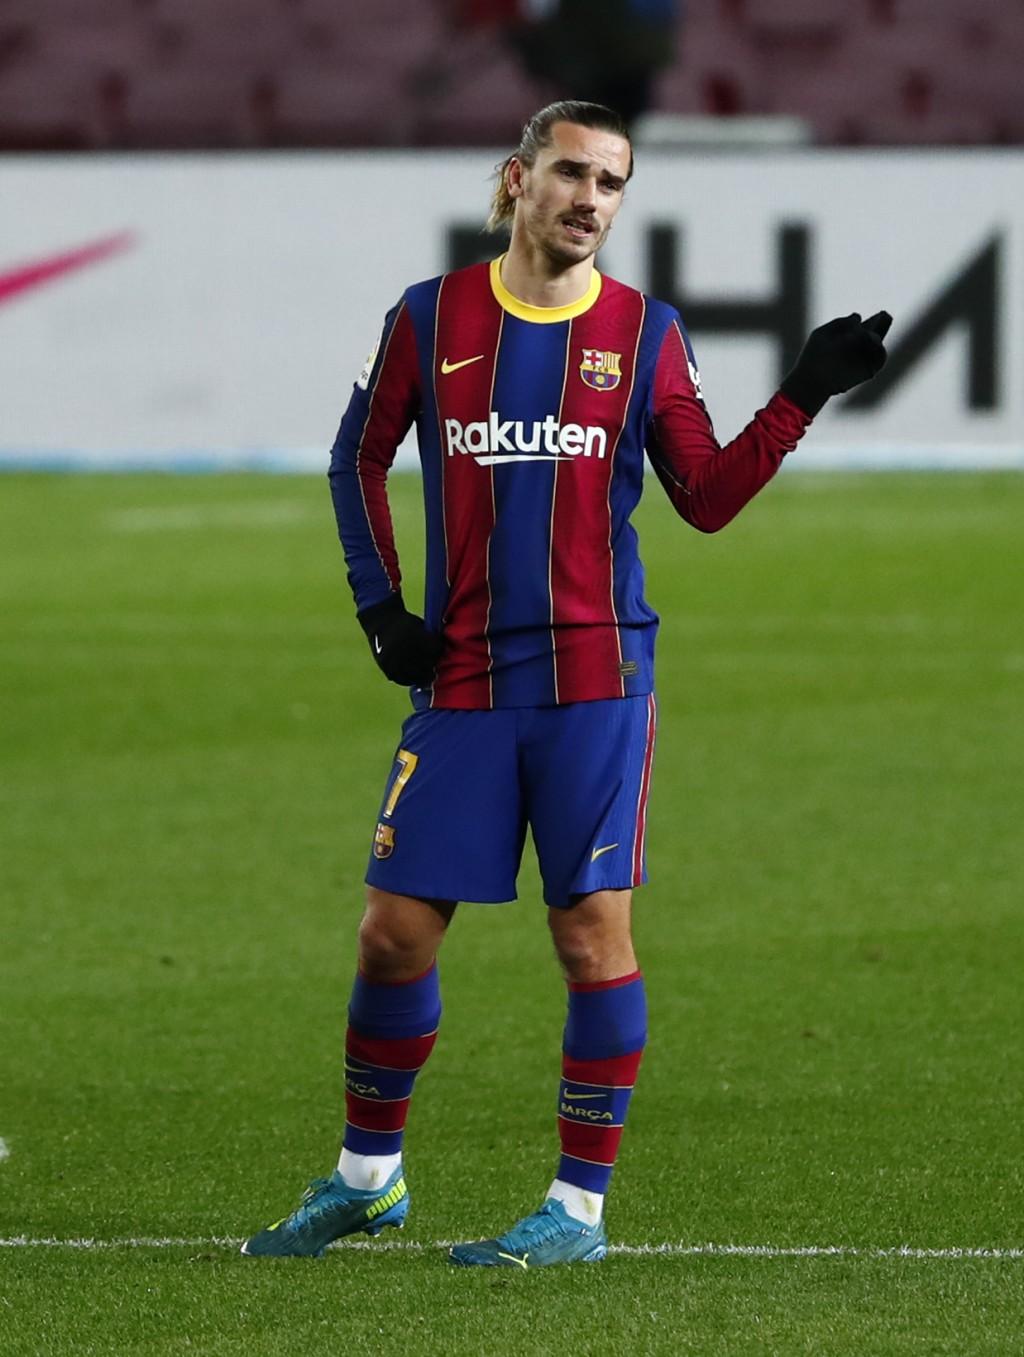 Barcelona's Antoine Griezmann gestures during the Spanish La Liga soccer match between Barcelona and Eibar at the Camp Nou stadium in Barcelona in Bar...